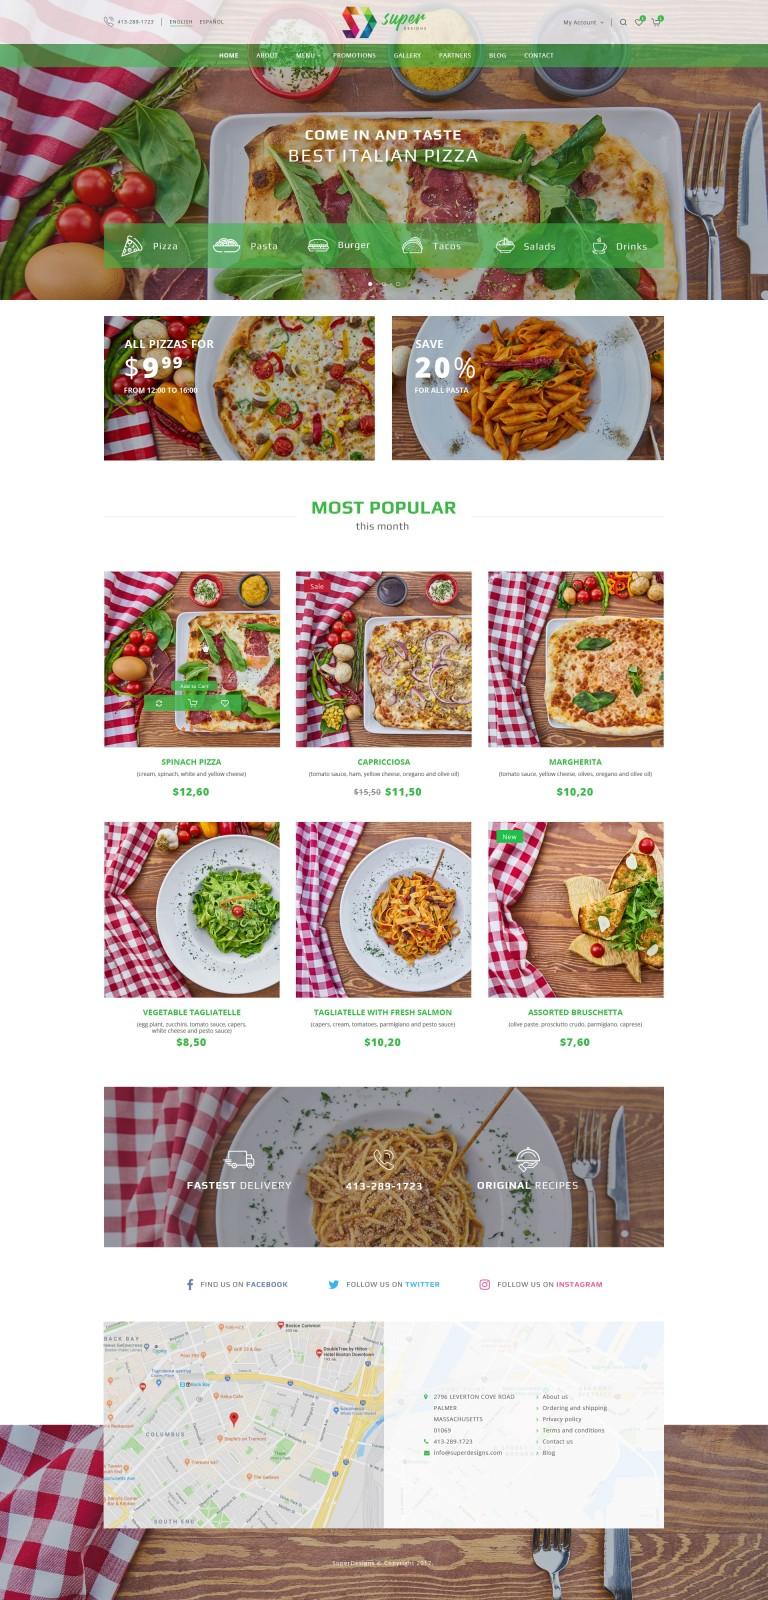 Food & Drinks #0120 - PSD - Oprencart